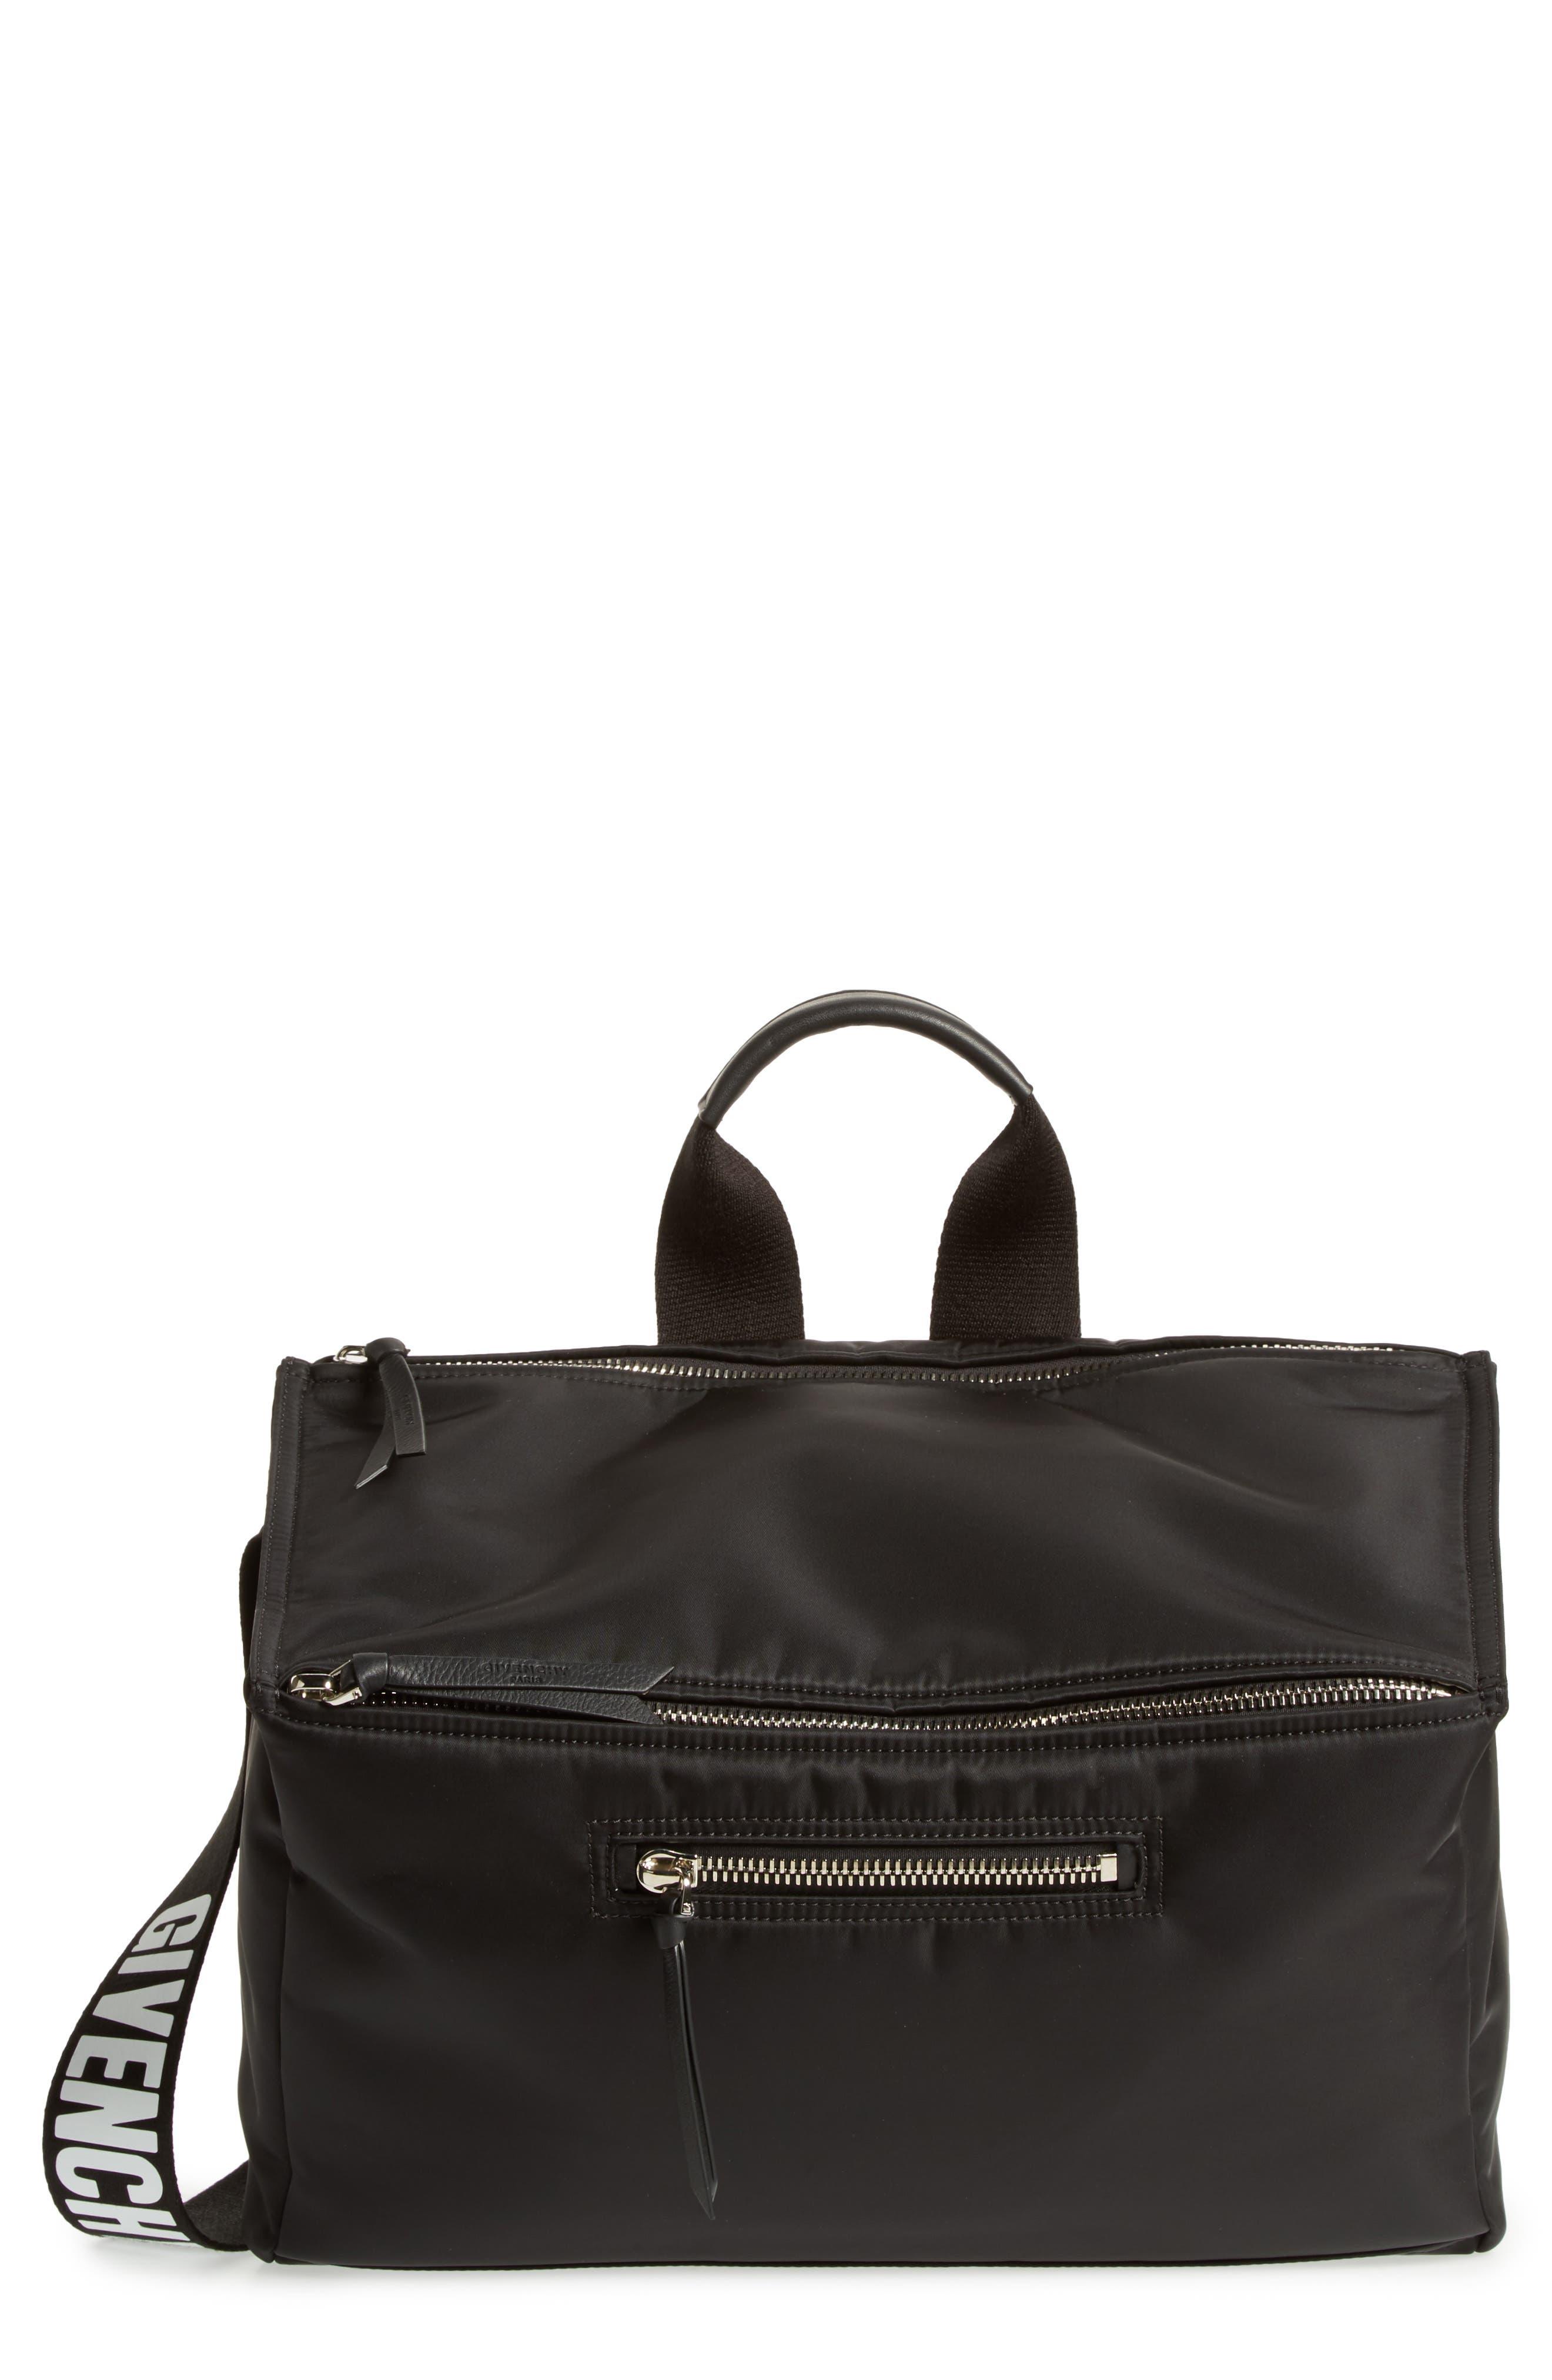 Givenchy Paris Pandora Shoulder Bag